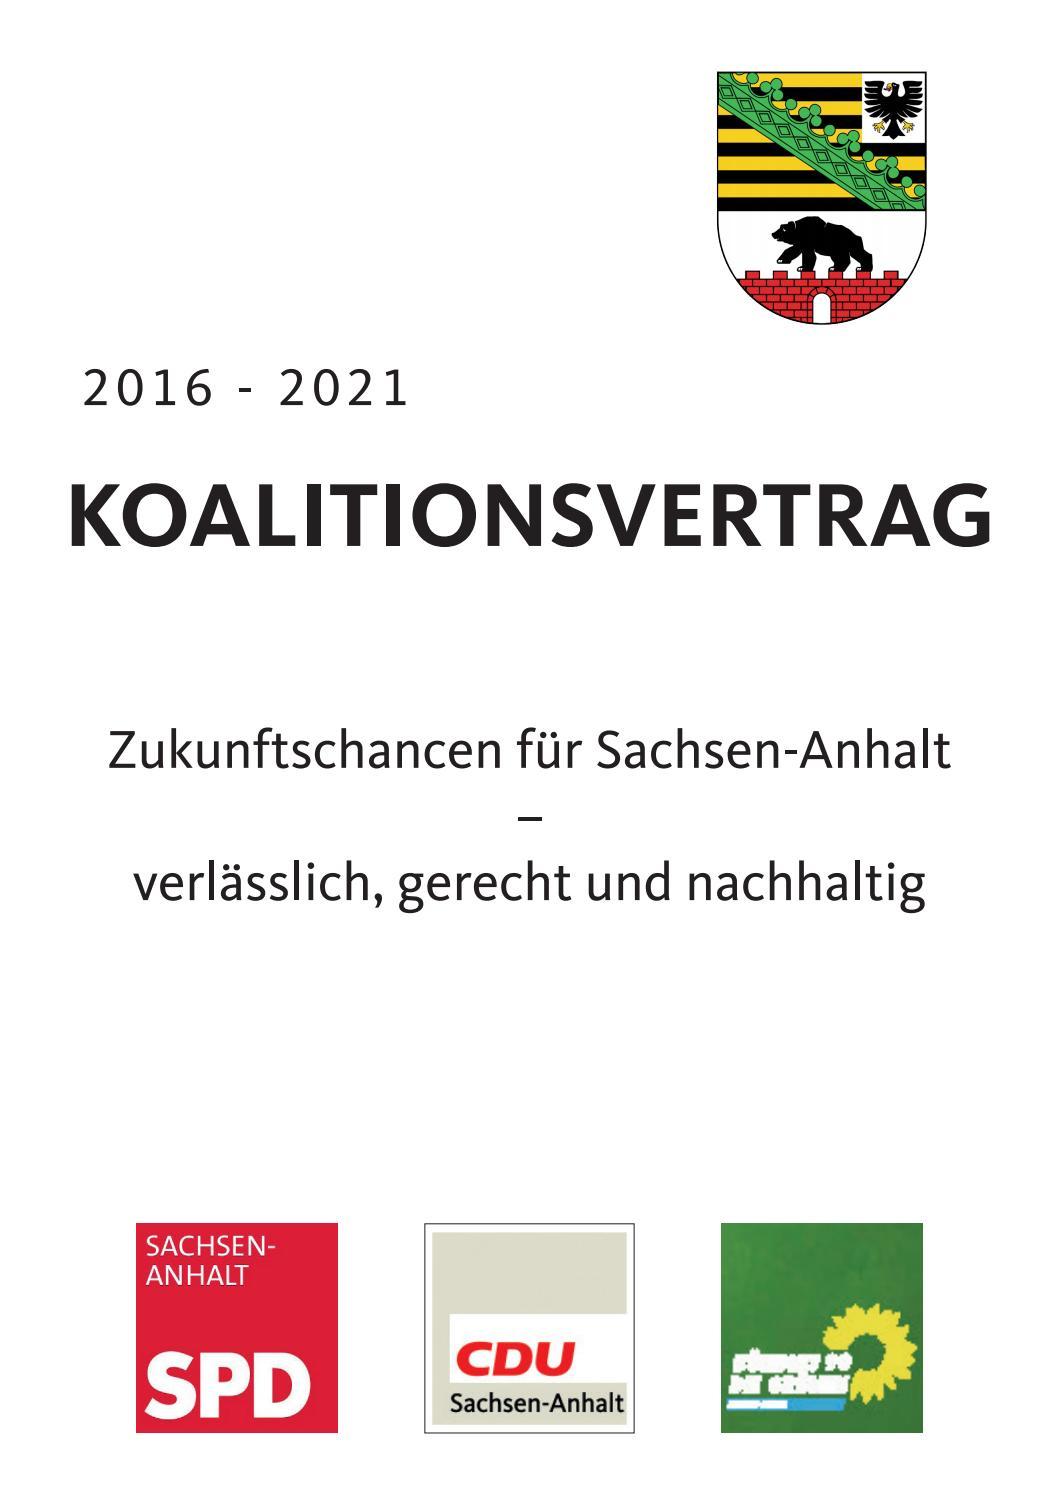 Koalitionsvertrag Sachsen Anhalt 2021